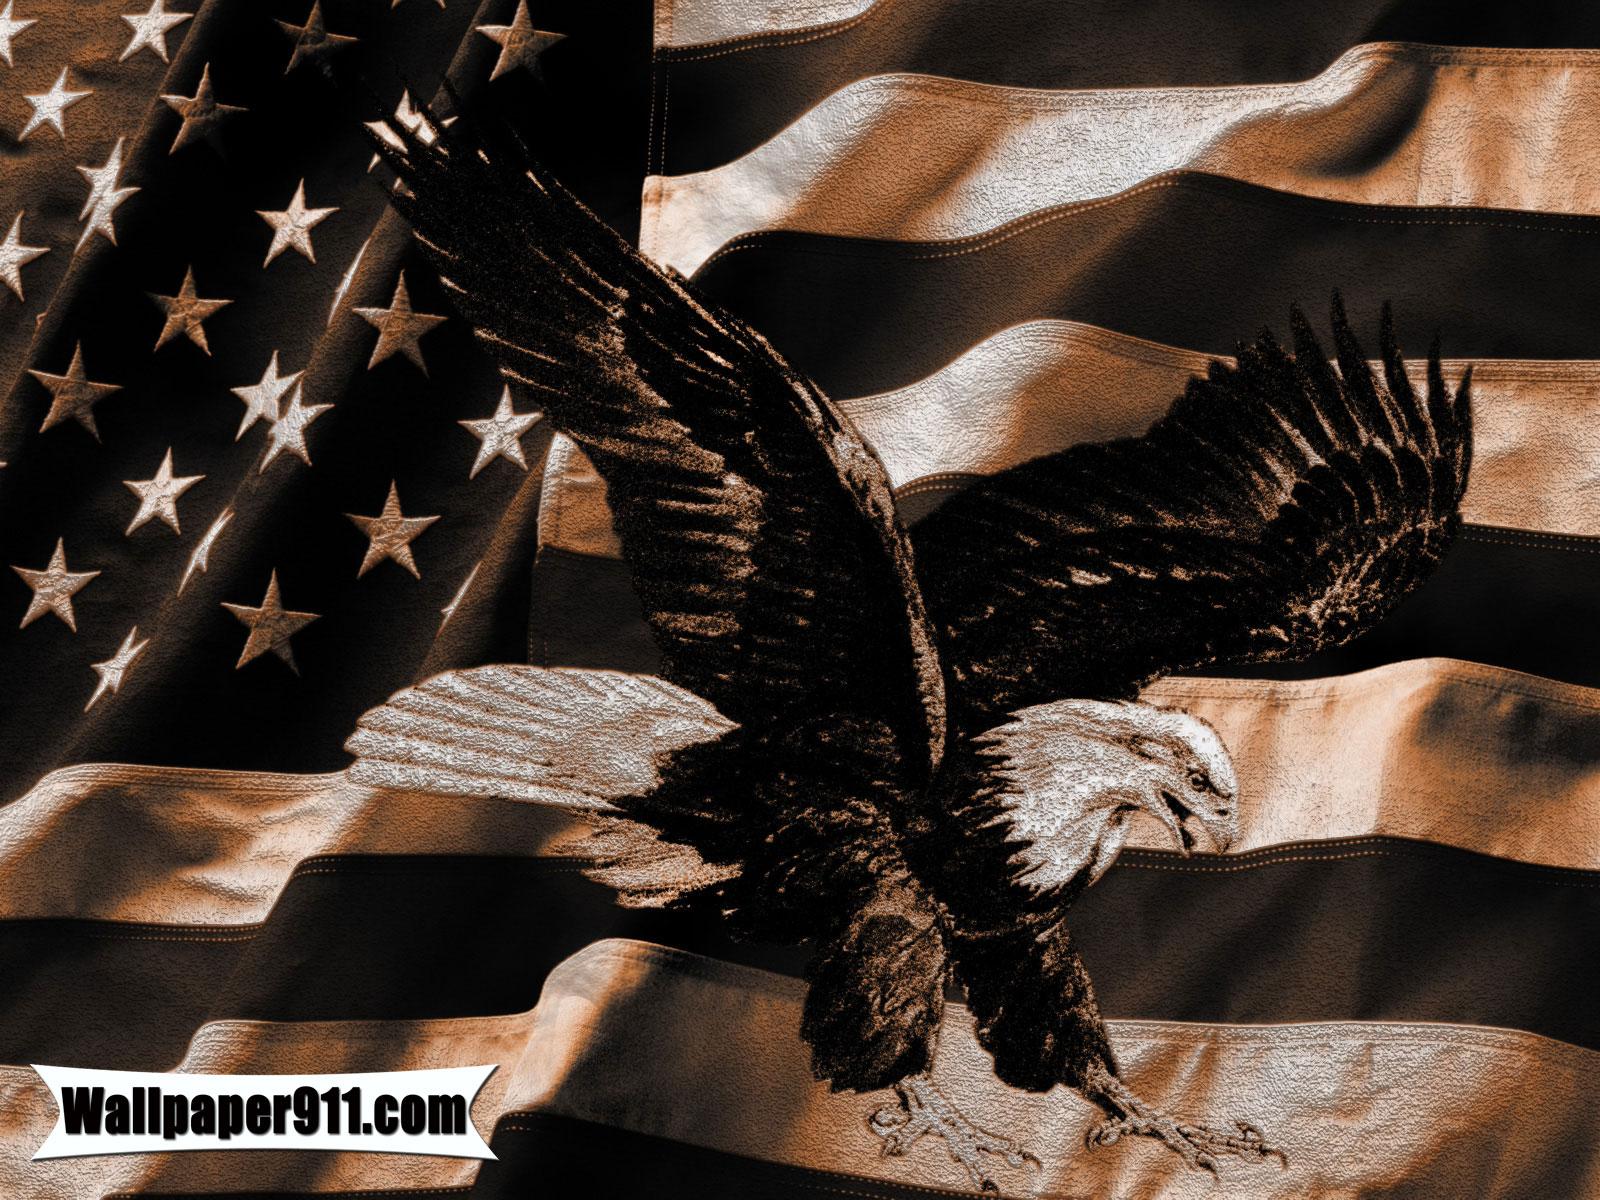 patriotic desktopjpg 1600x1200